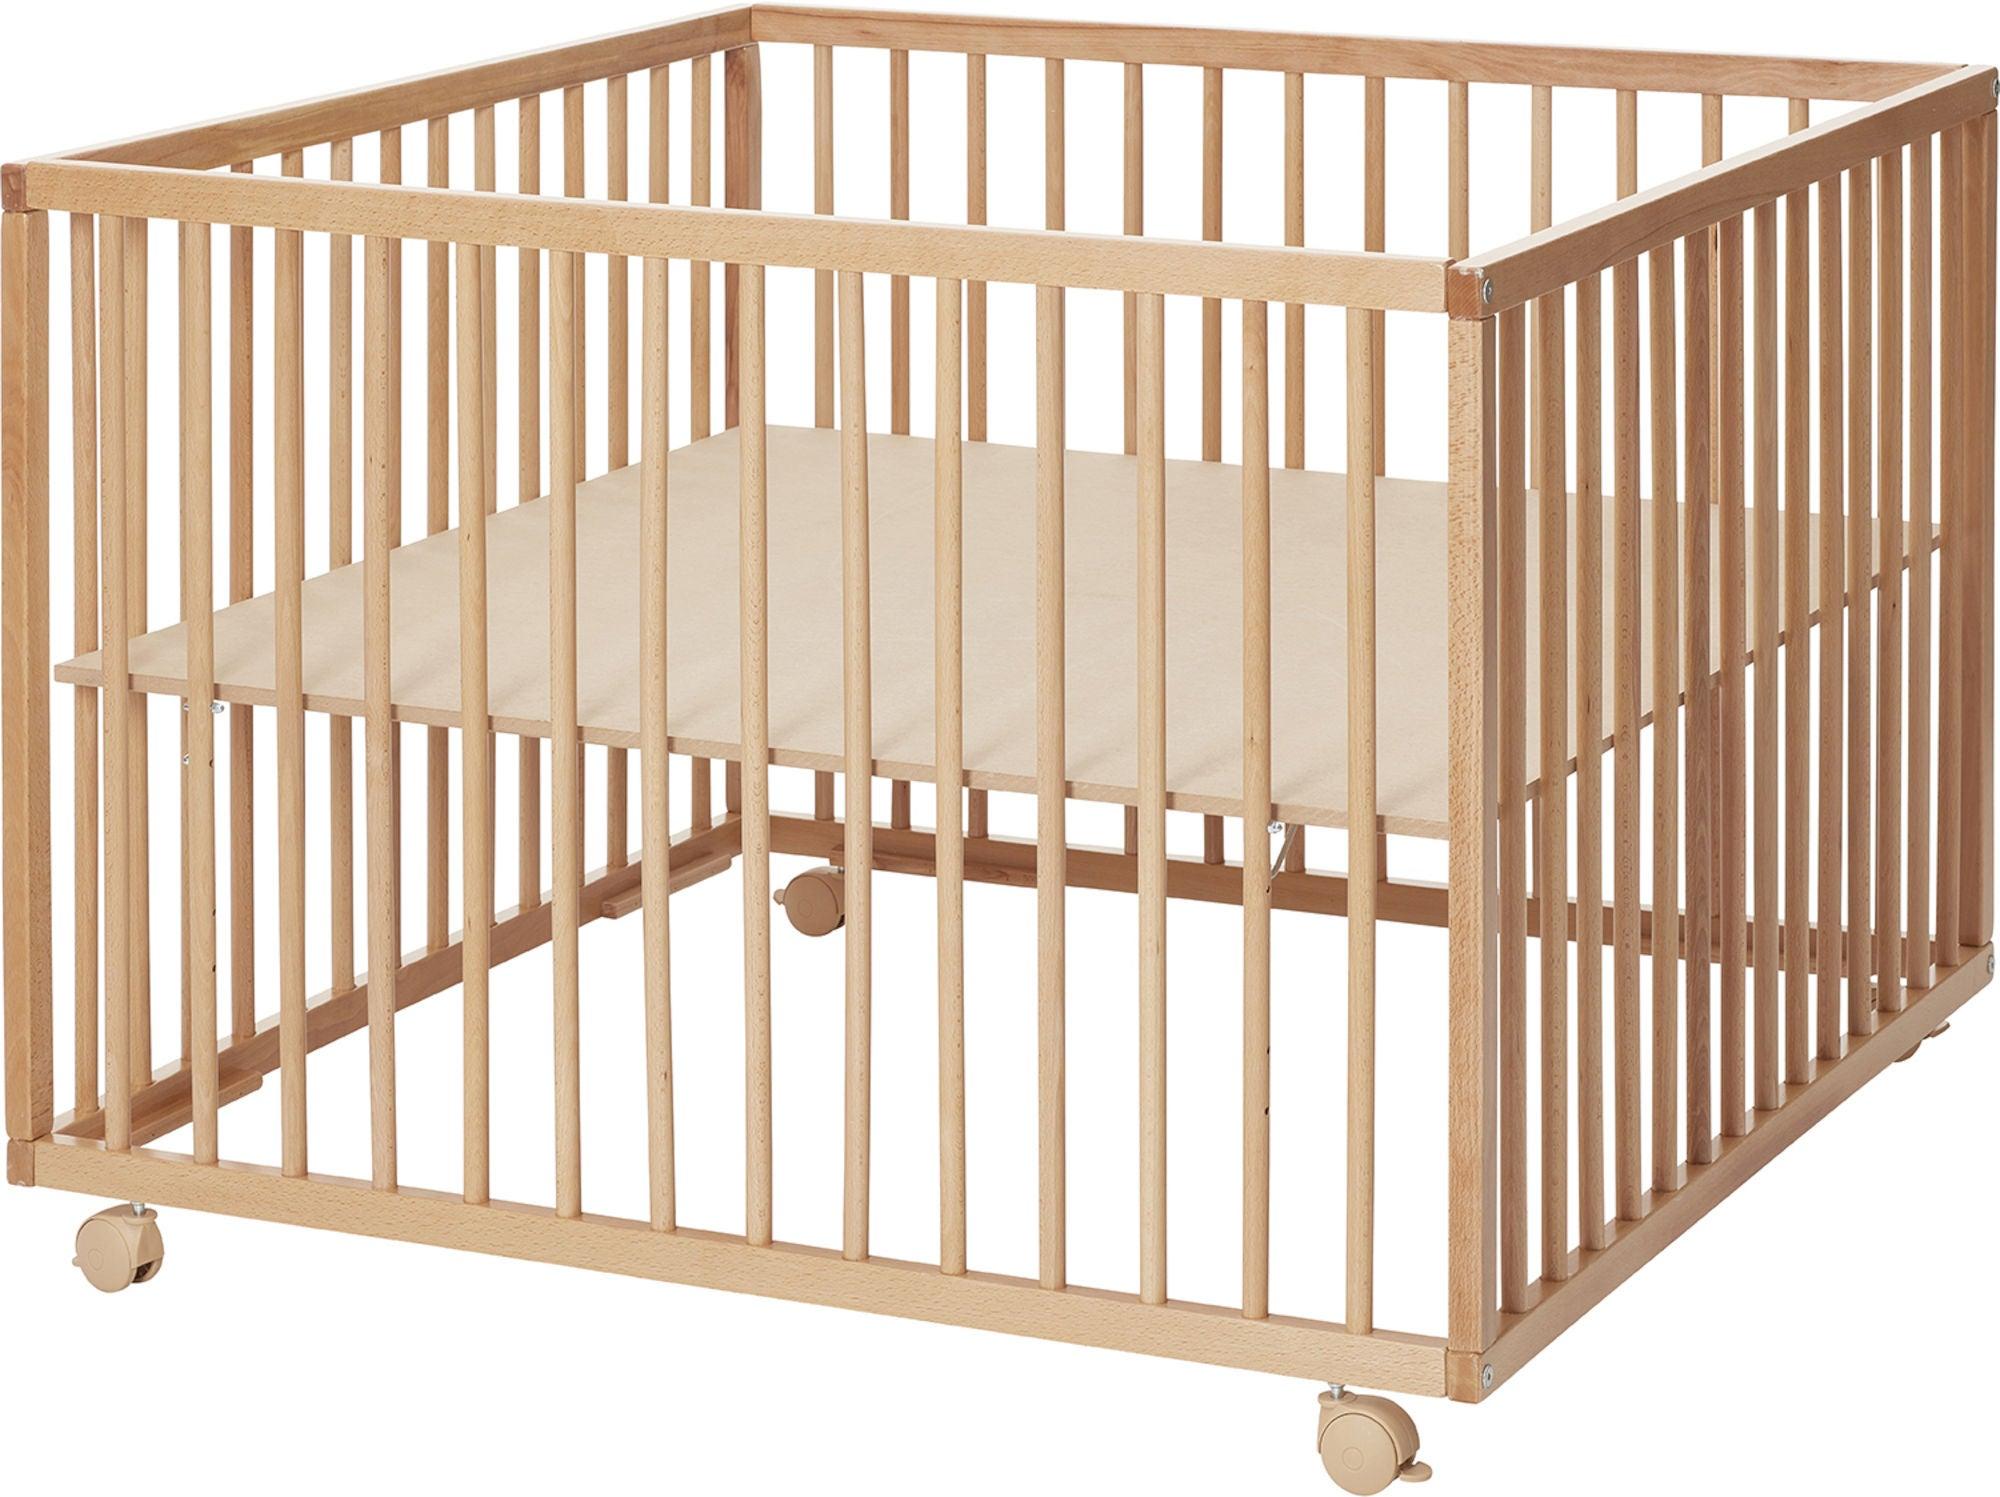 BabyDan Comfort Leikkikehä 99x99x73, Puu